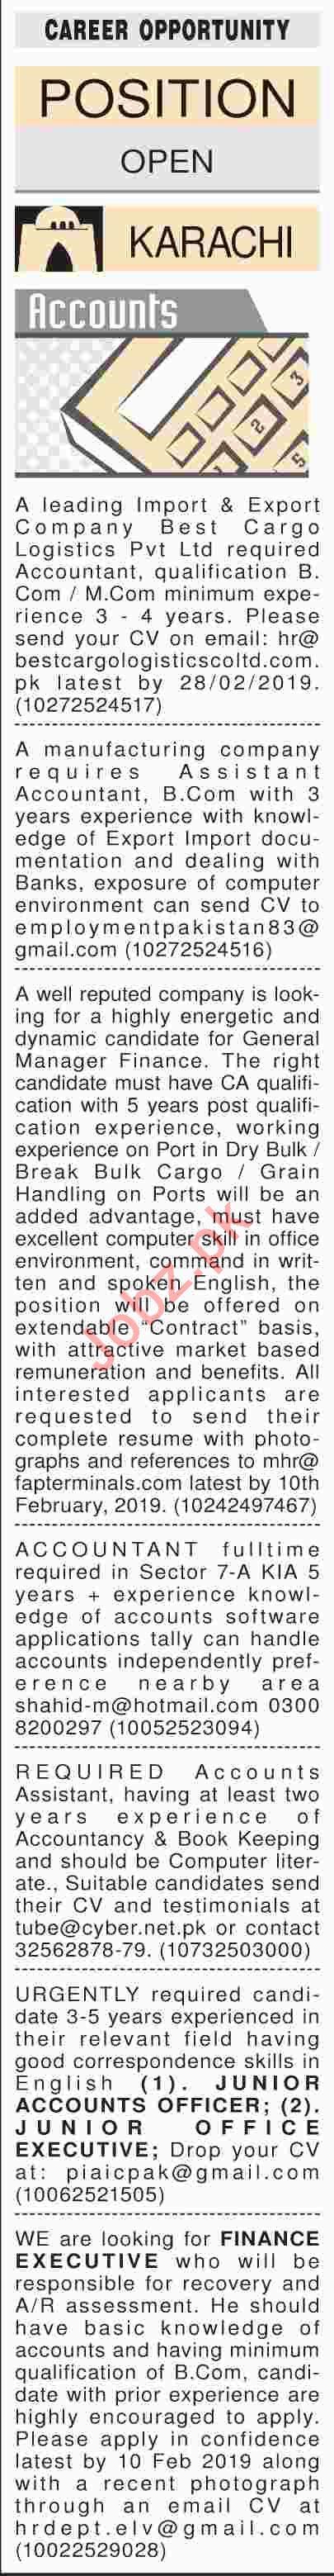 Dawn Sunday Newspaper Accounts Classified Jobs 03/02/2019